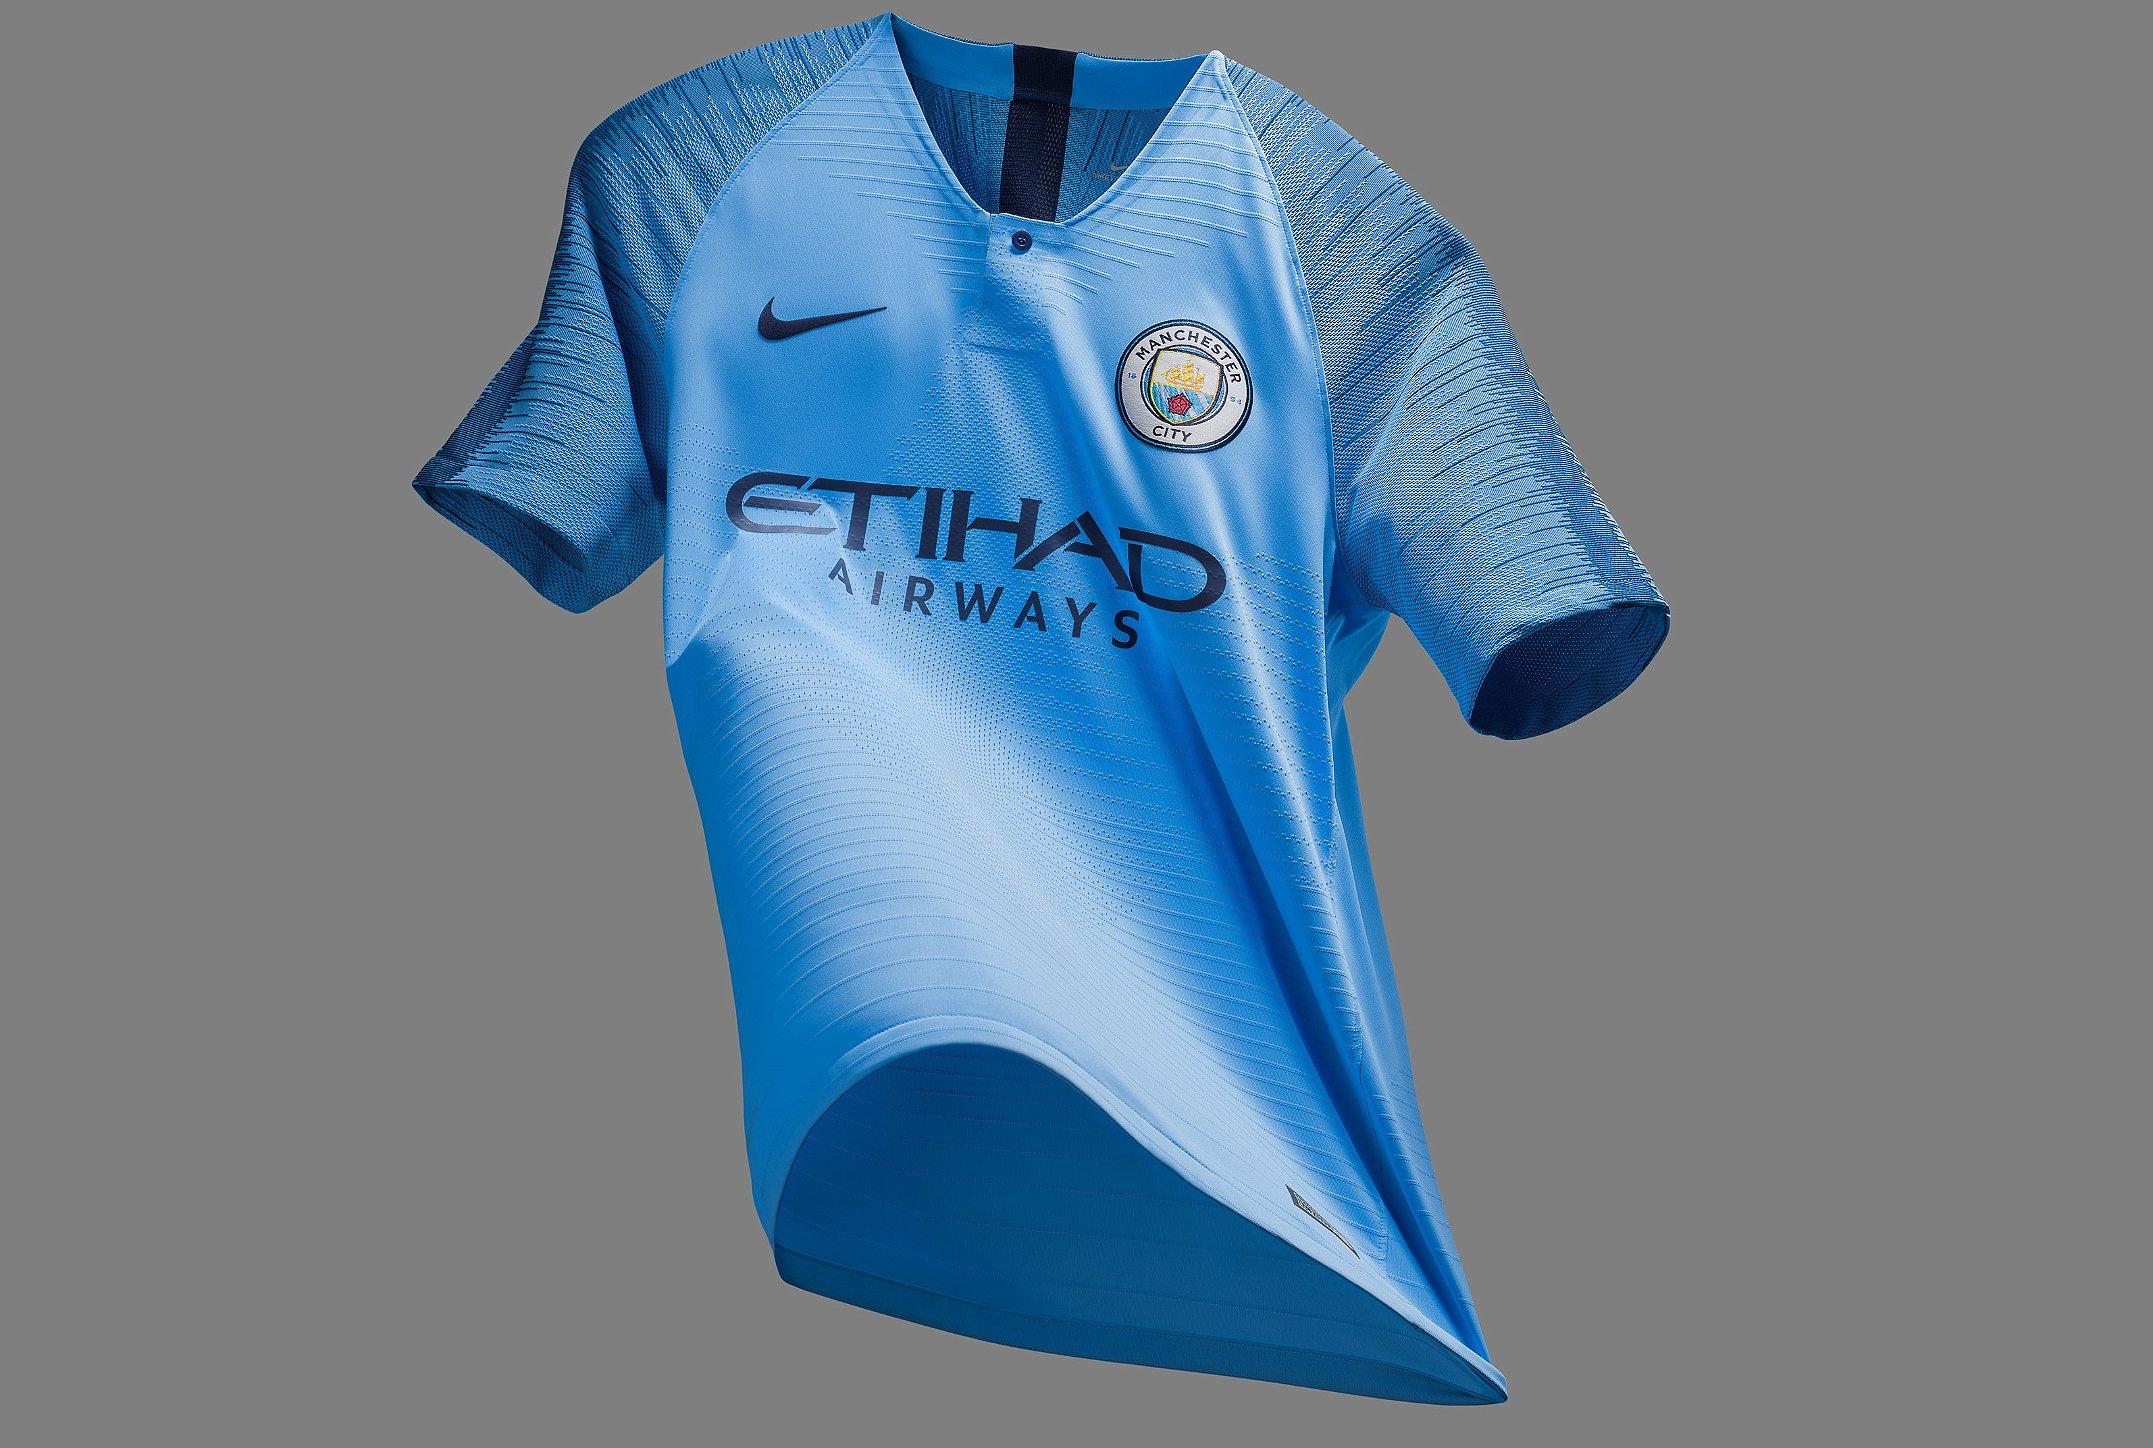 Camisa Nike MANCHESTER CITY 18 19 Home TORCEDOR - Sandes Sports ... e0ce16a6230f3